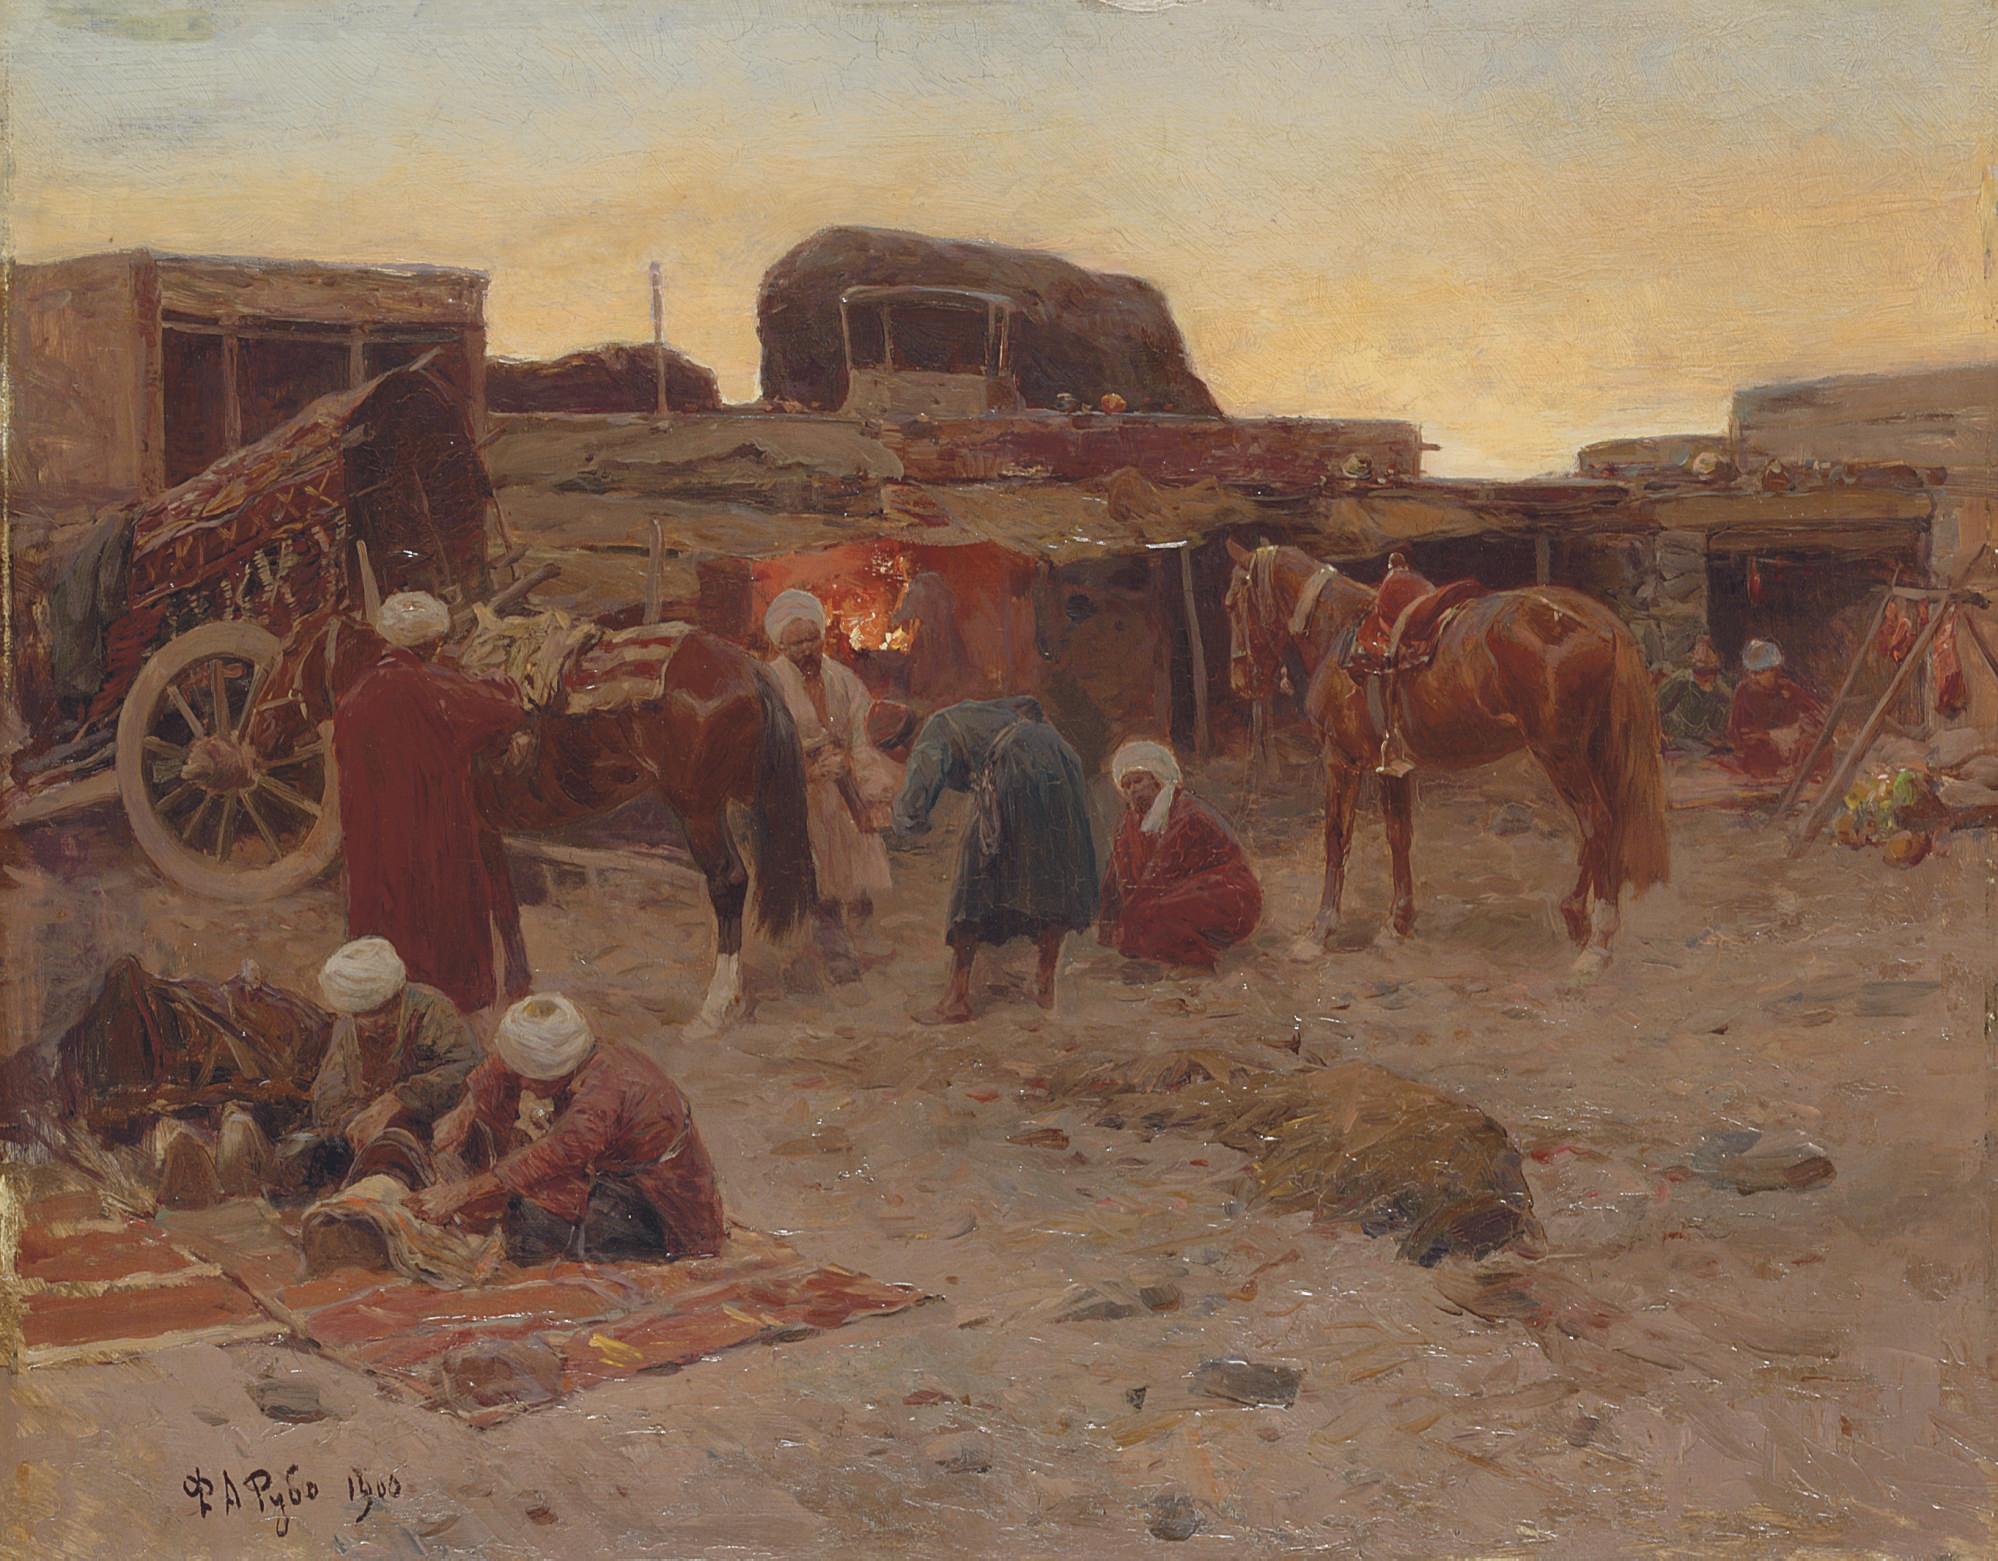 Evening falls at the camp